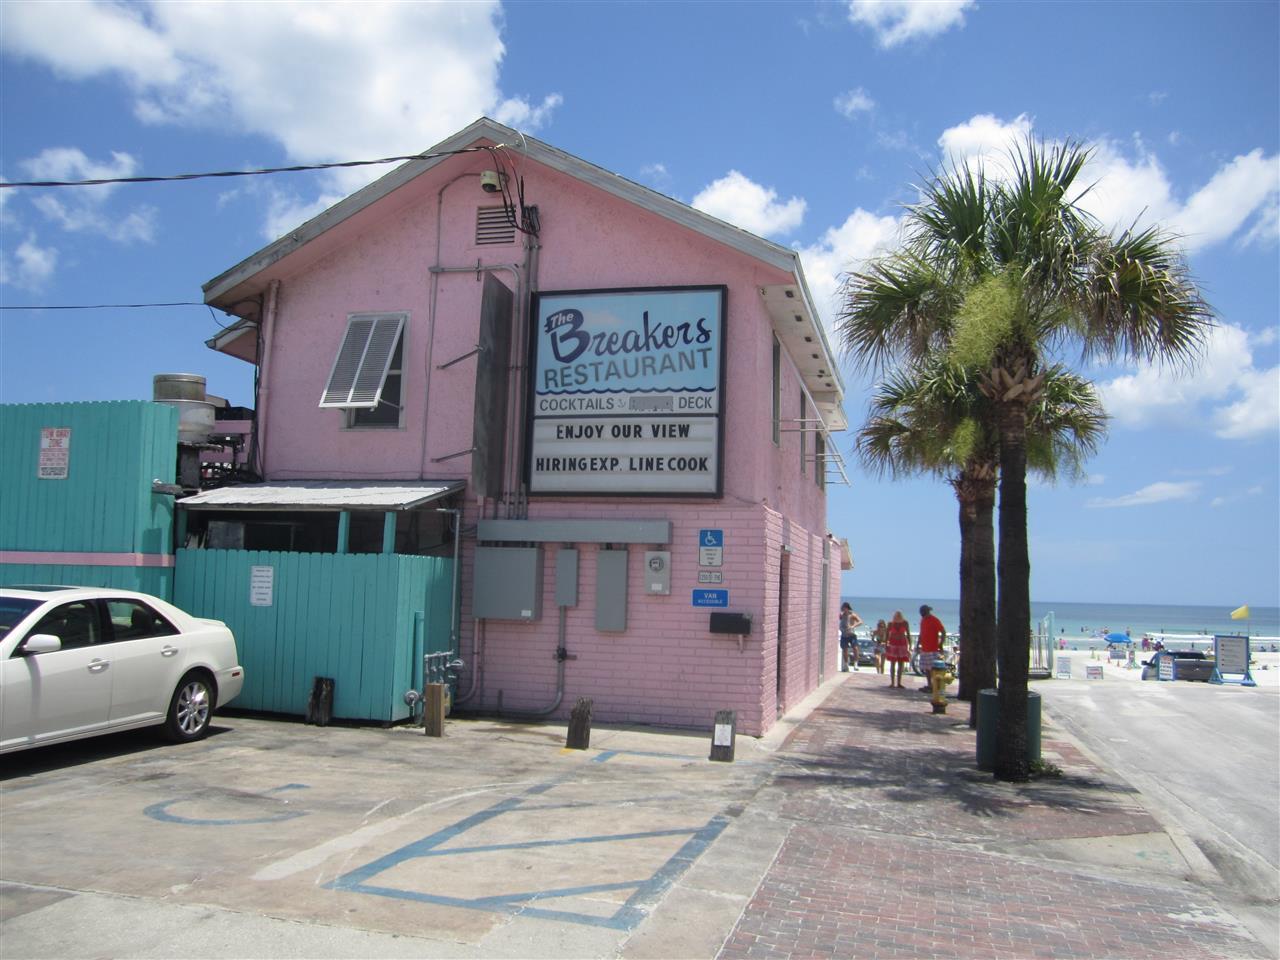 #New Smyrna Beach, FL